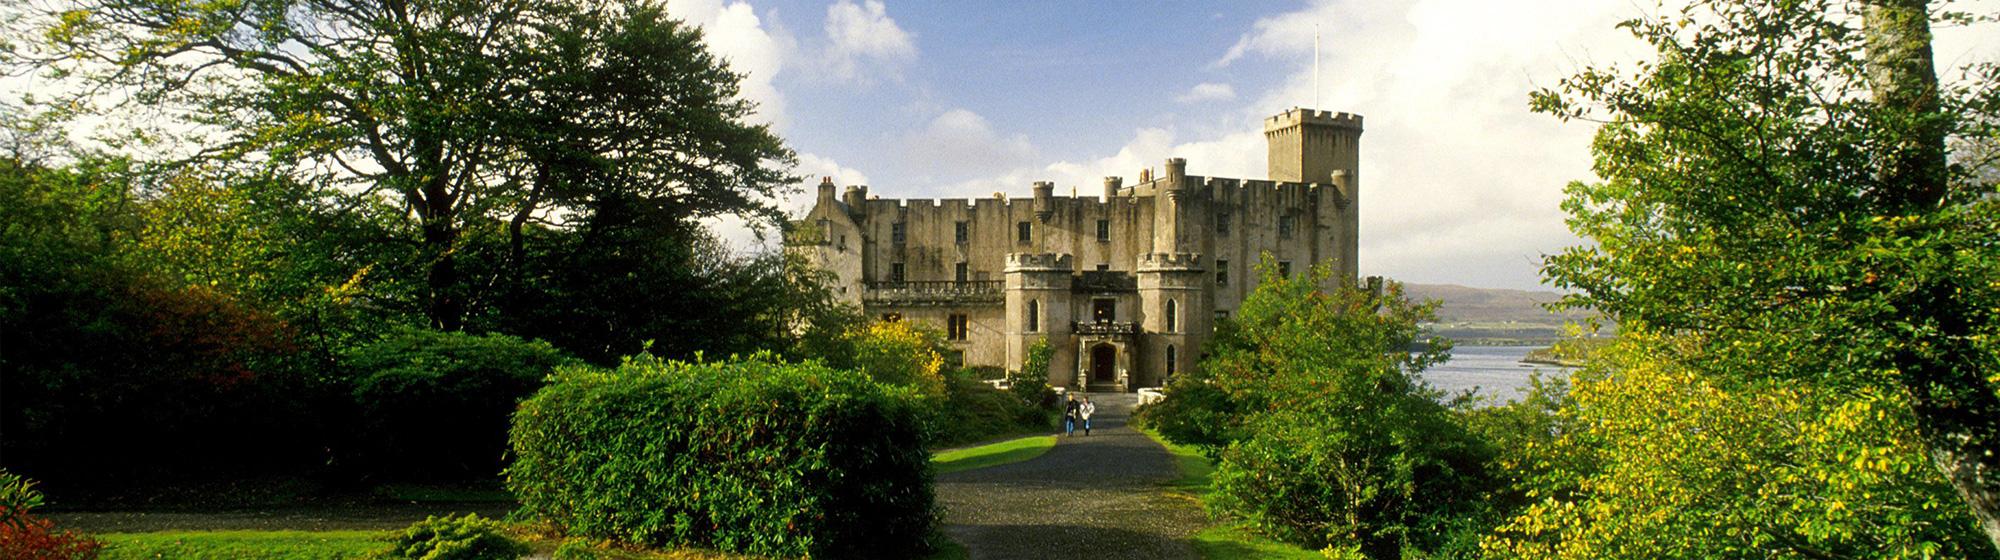 Castles image1